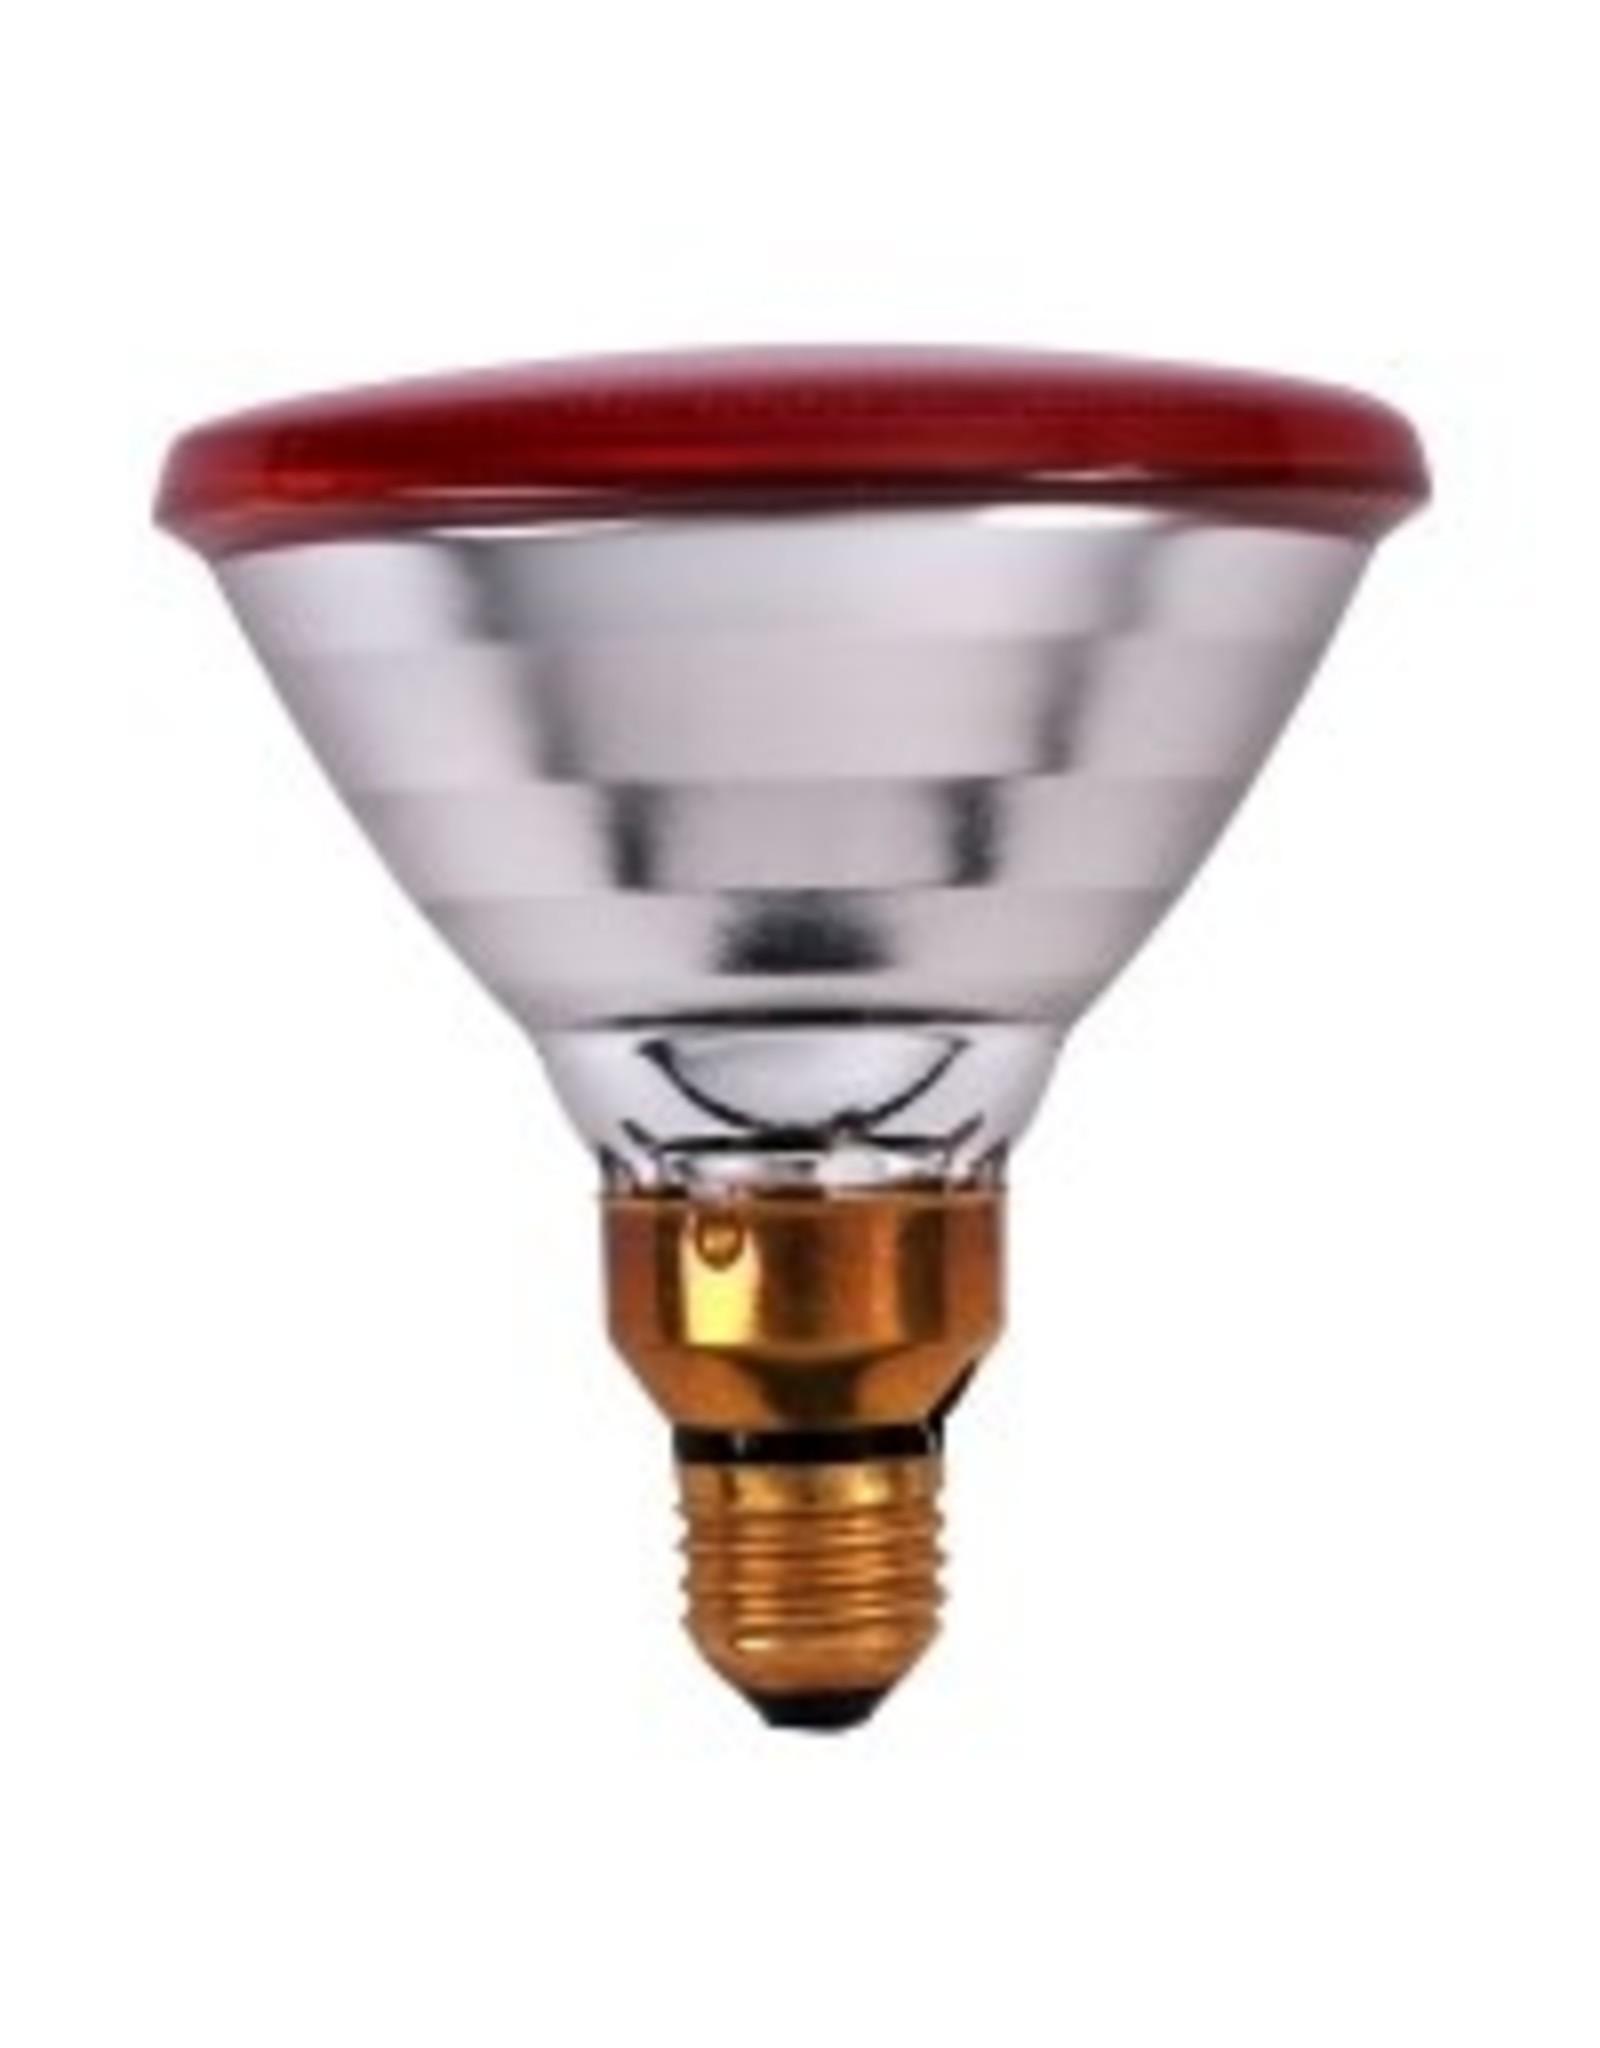 Broed accessoires Verw Lamp PAR 100w - 1 Stuks